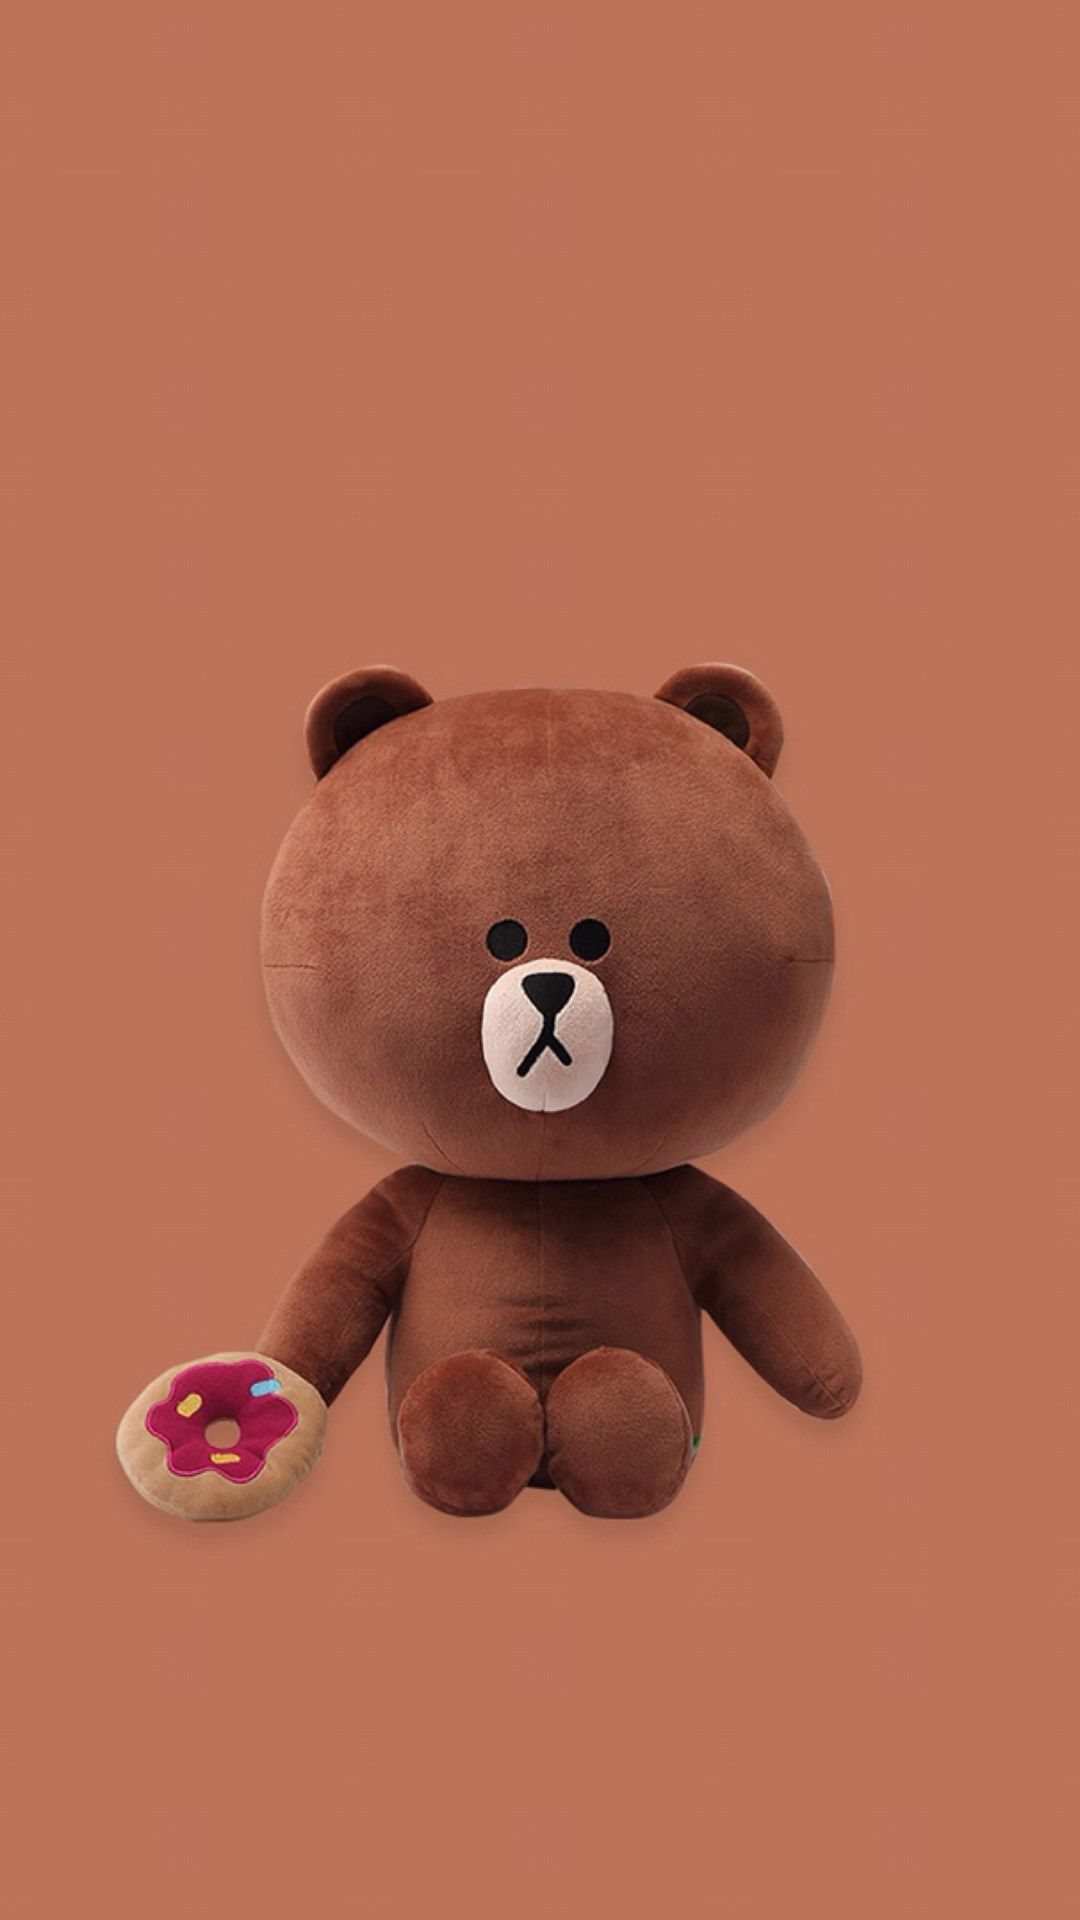 ☺iphone 7 wallpaper HD438 Cartoon bear, Wallpaper and